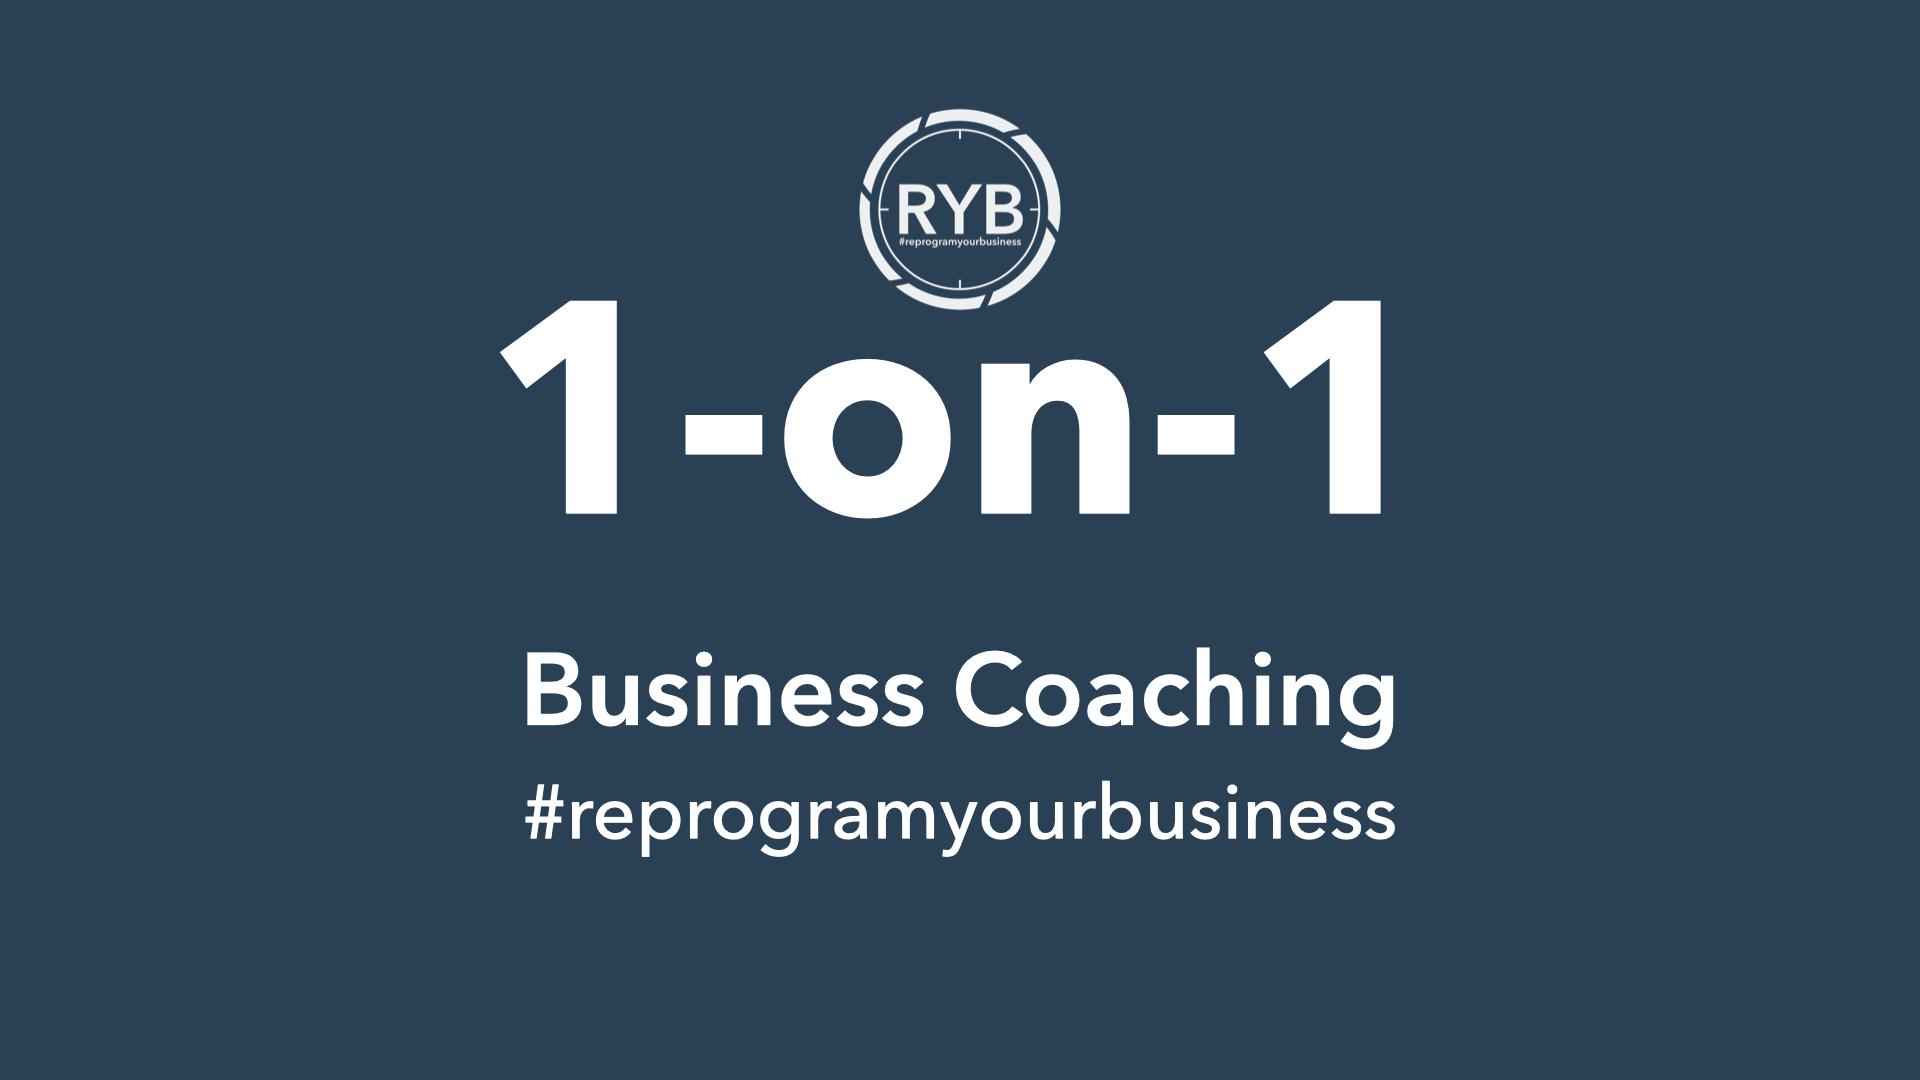 1-on-1 Business Coaching | #reprogramyourbusiness